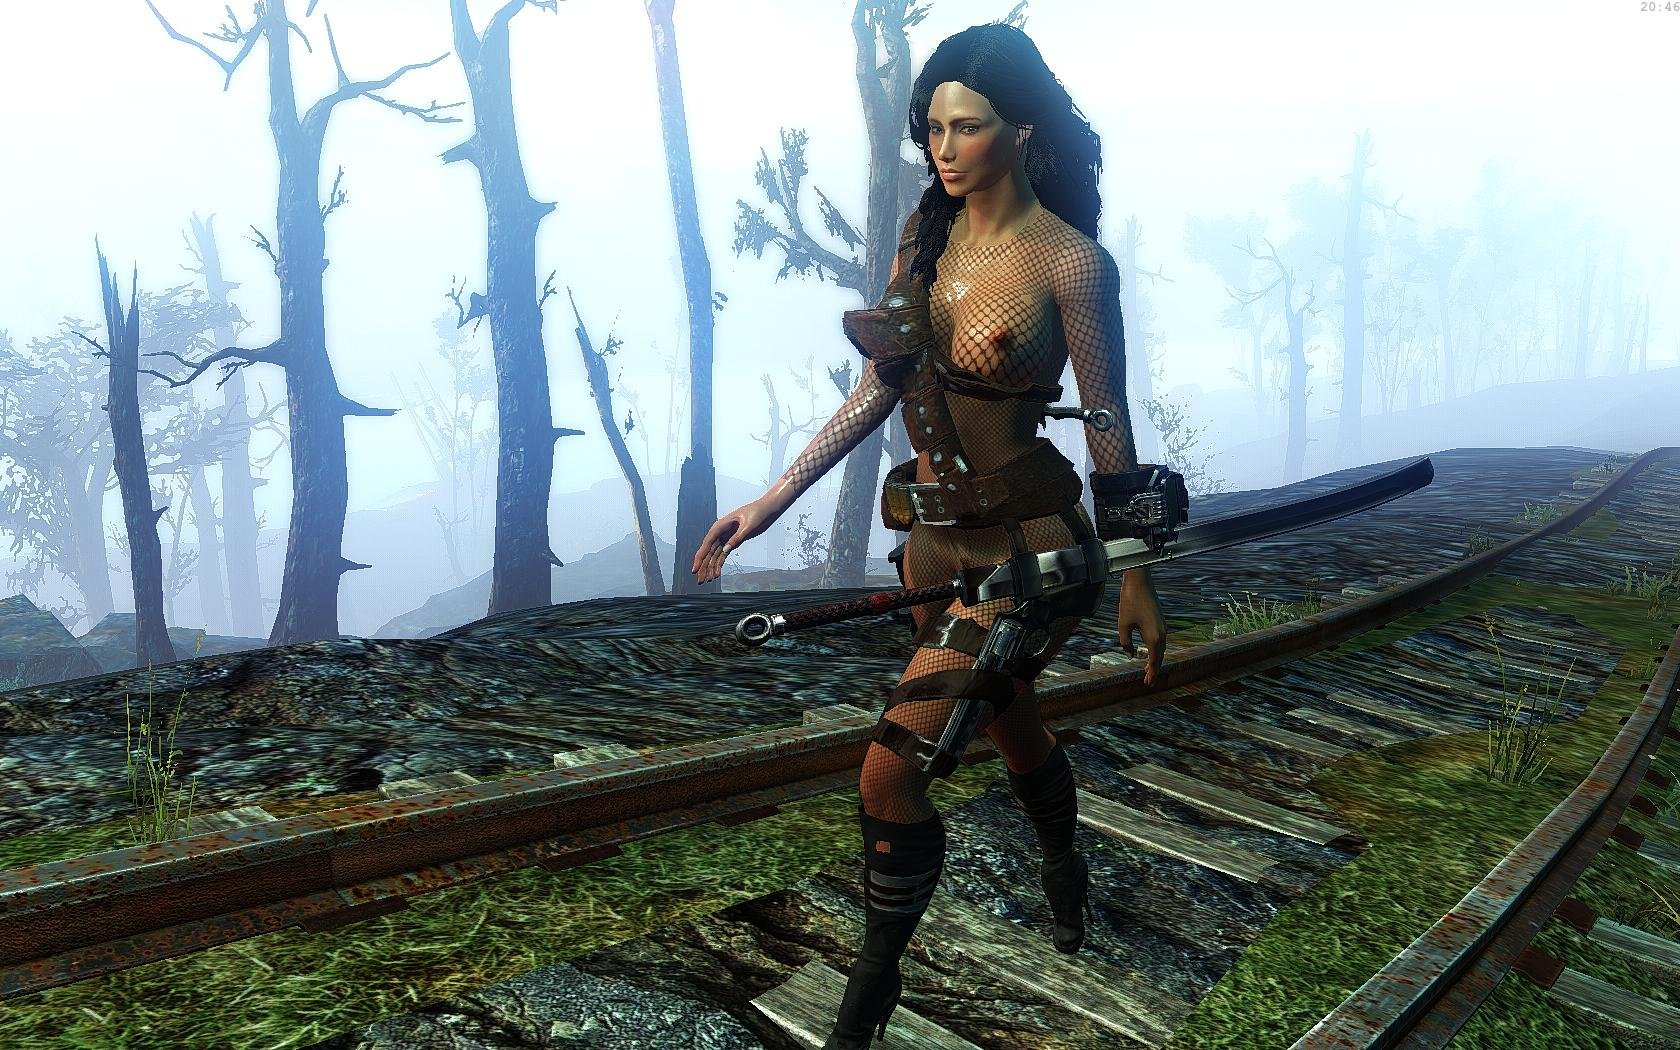 Fallout4 2019-01-22 20-46-27-08